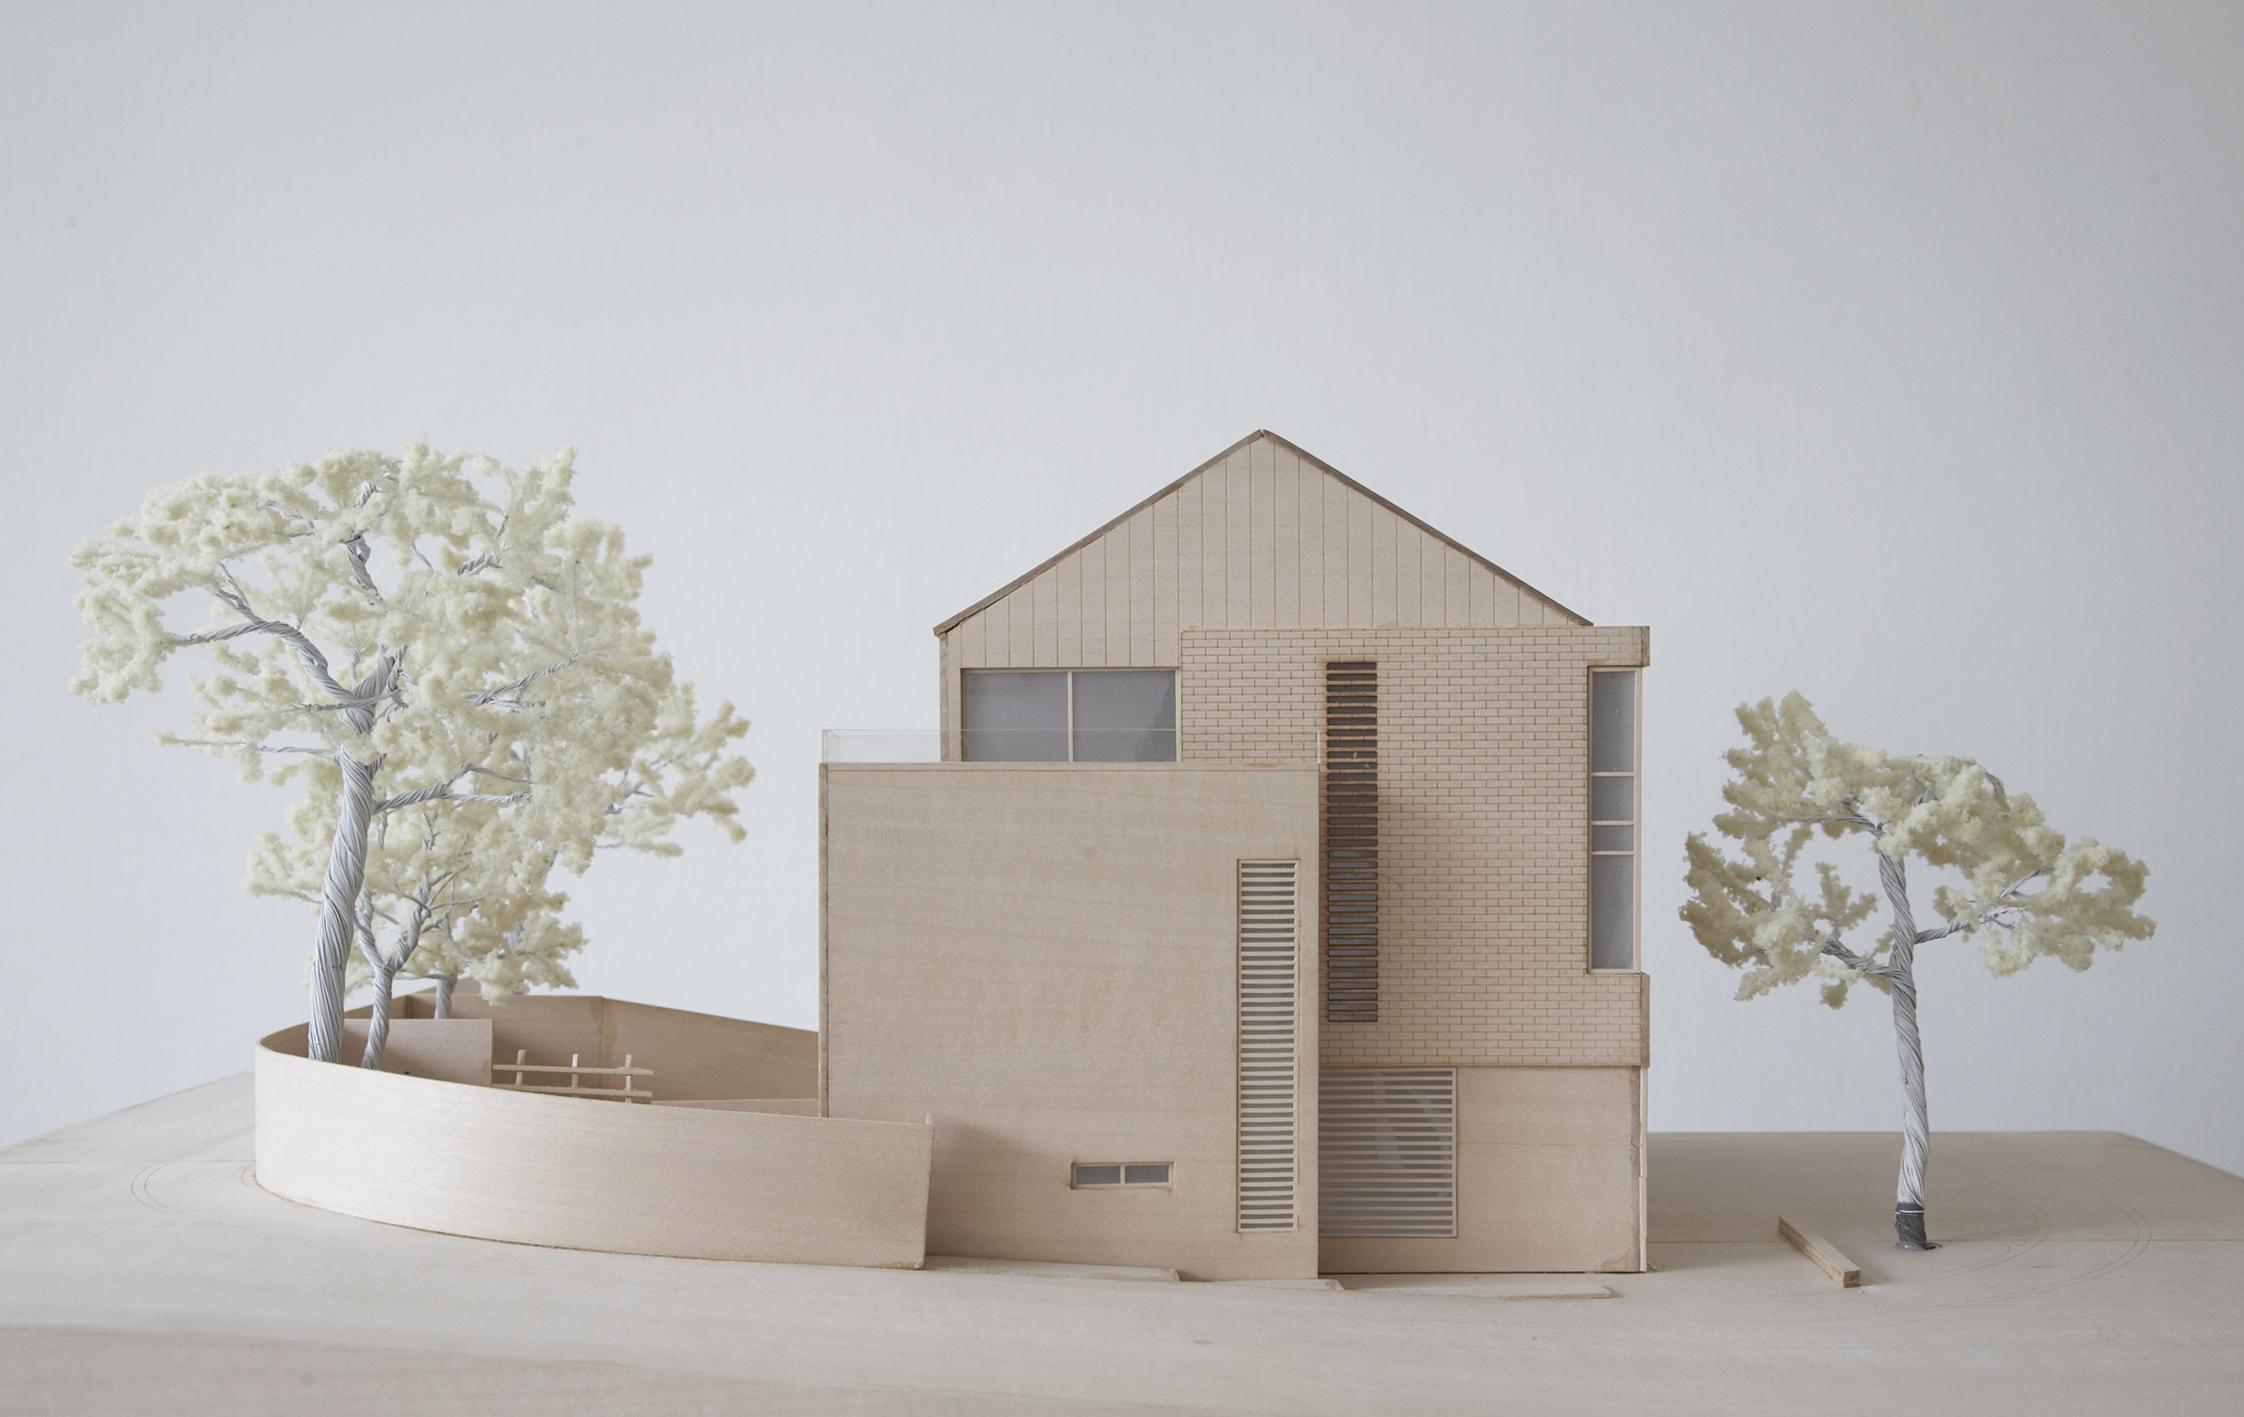 Model Modern Contemporary Architect House Wimbledon London Detail Brickwork